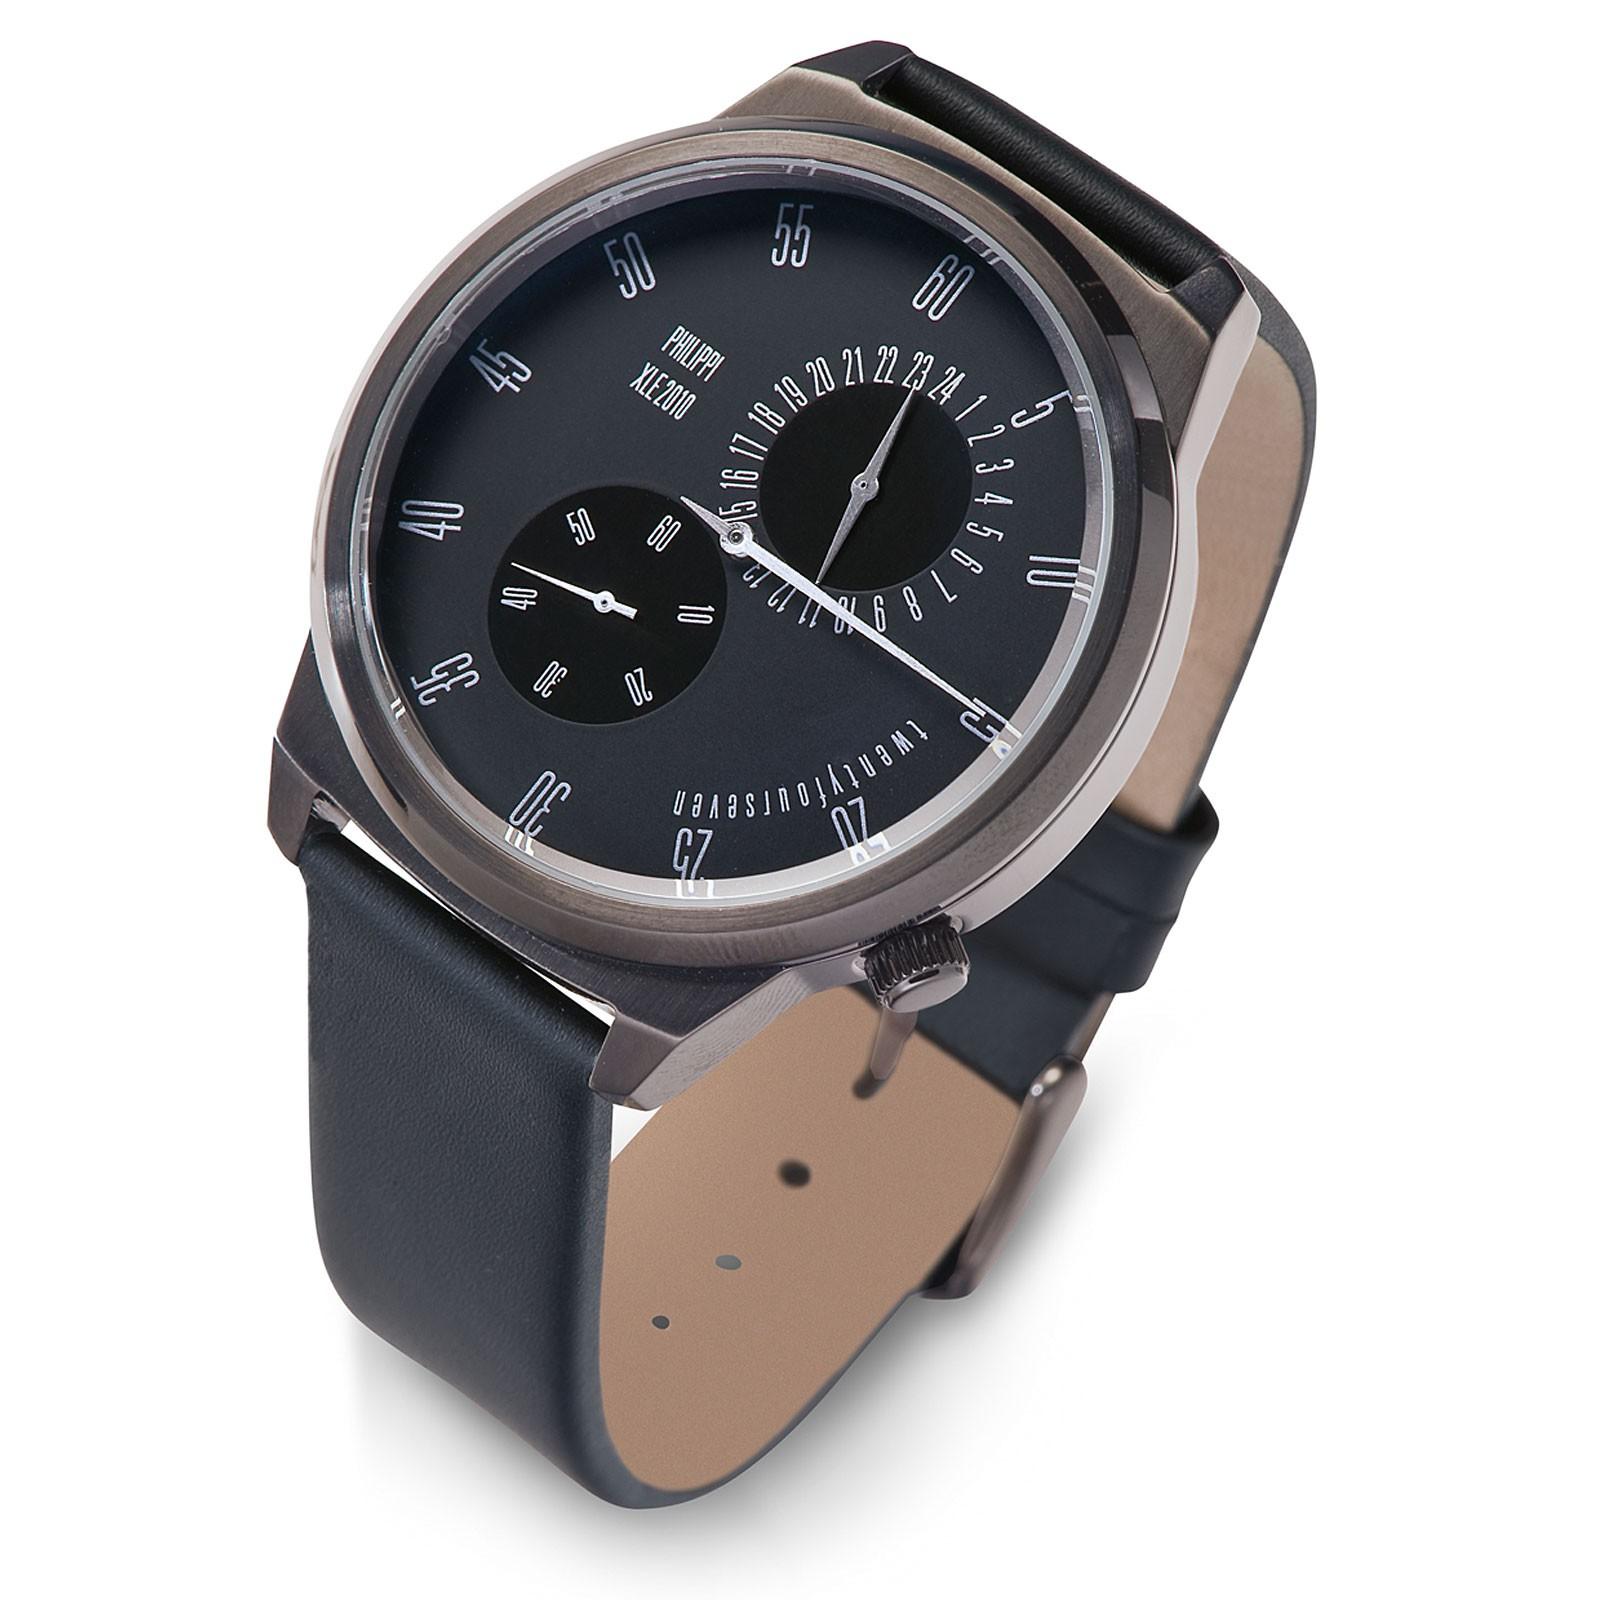 Armbanduhr Uhr One Hand O1 Leder Philippi TEMPUS